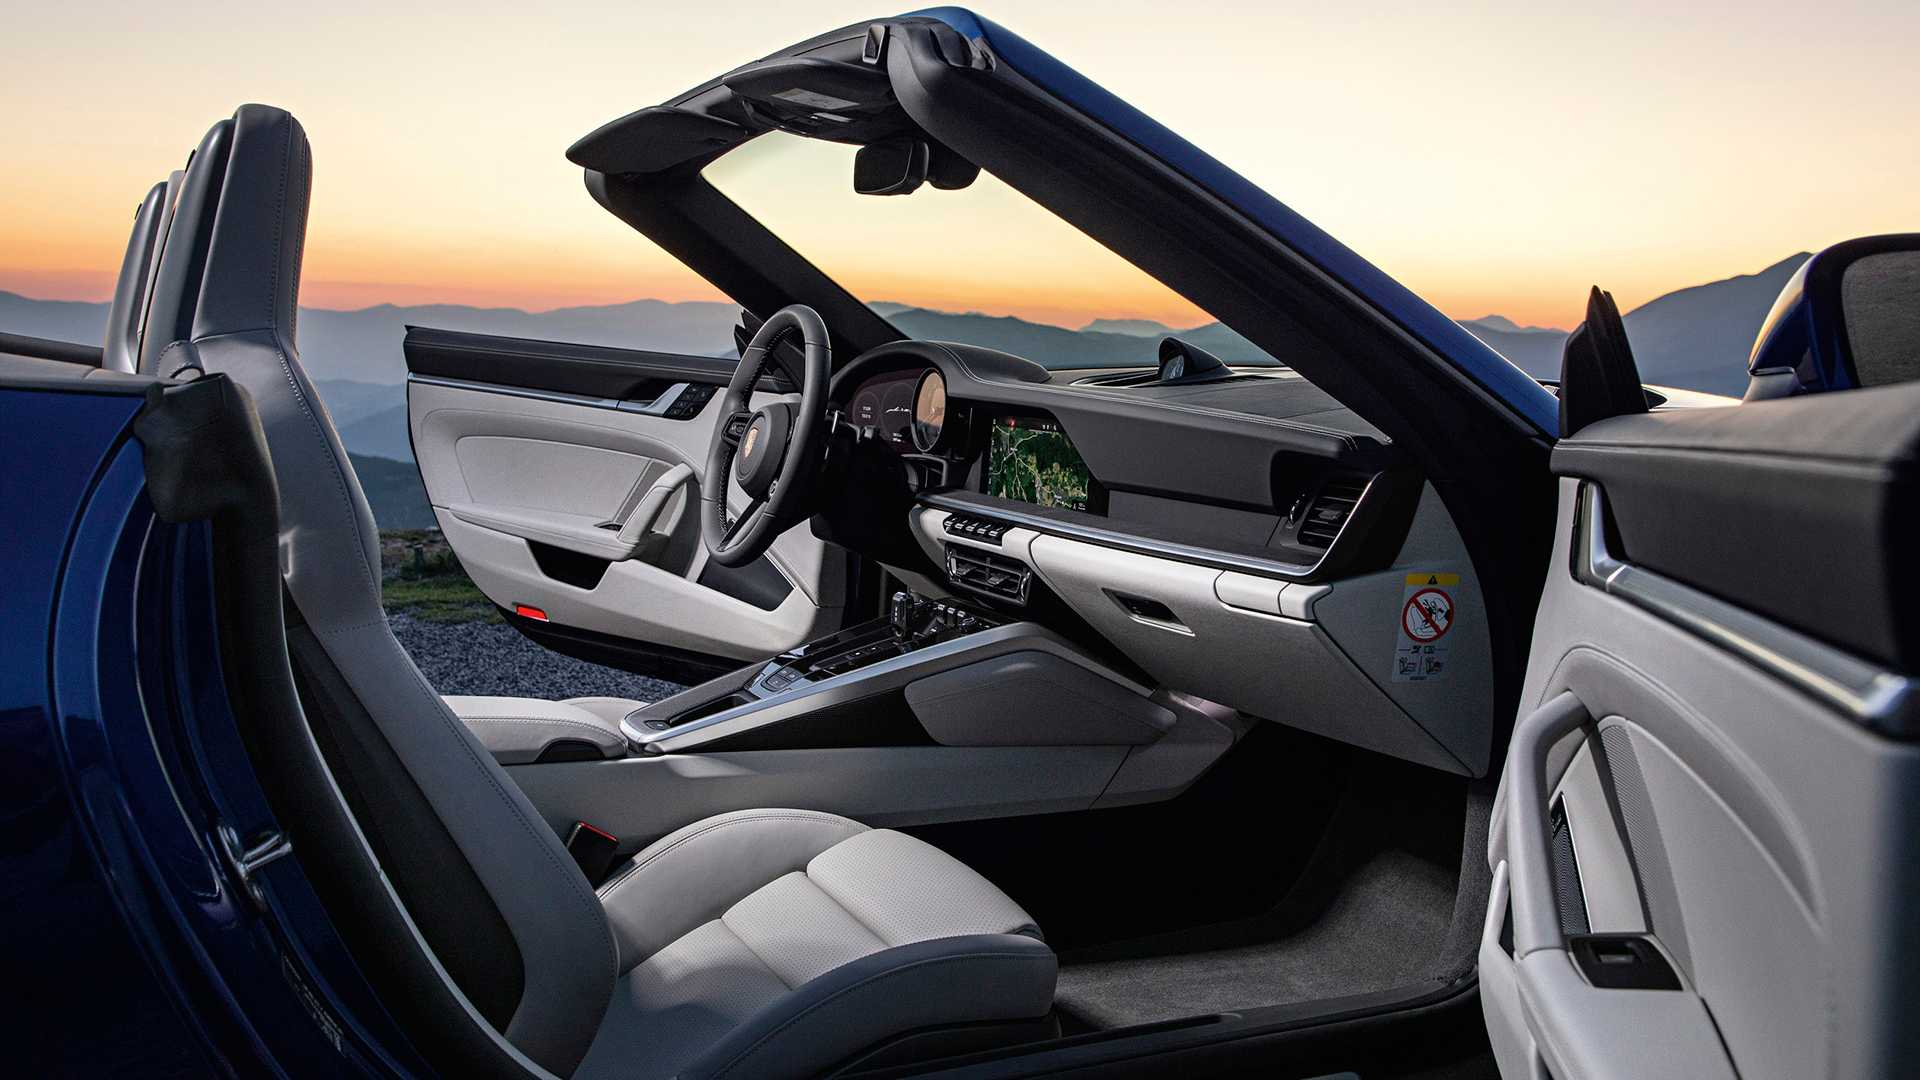 2020-porsche-911-cabriolet (1)